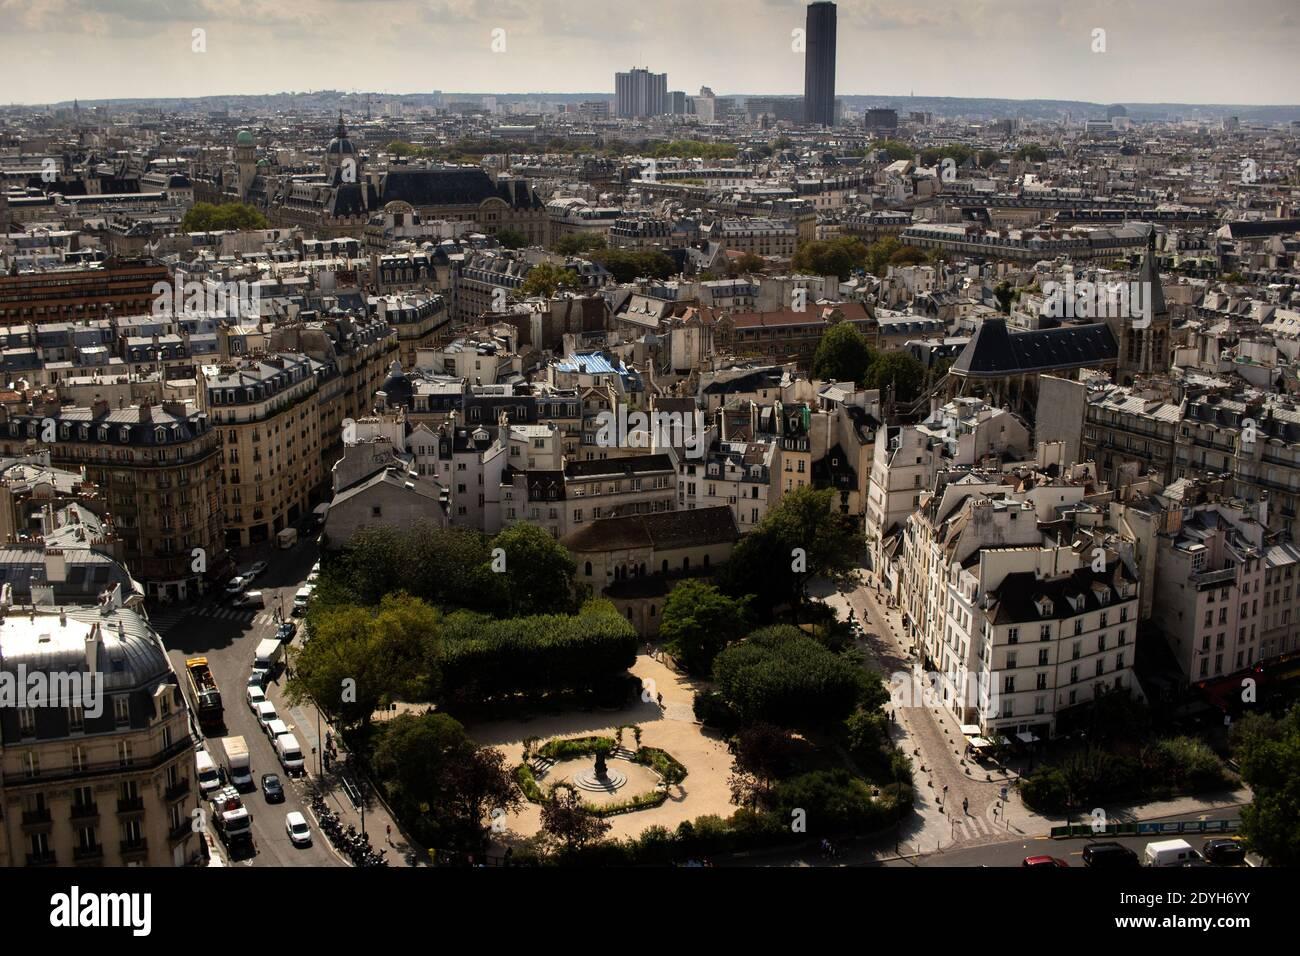 Lllustration de la vida cotidiana en París, Francia. Lllustration du quotidien à Paris en Francia. Foto de stock